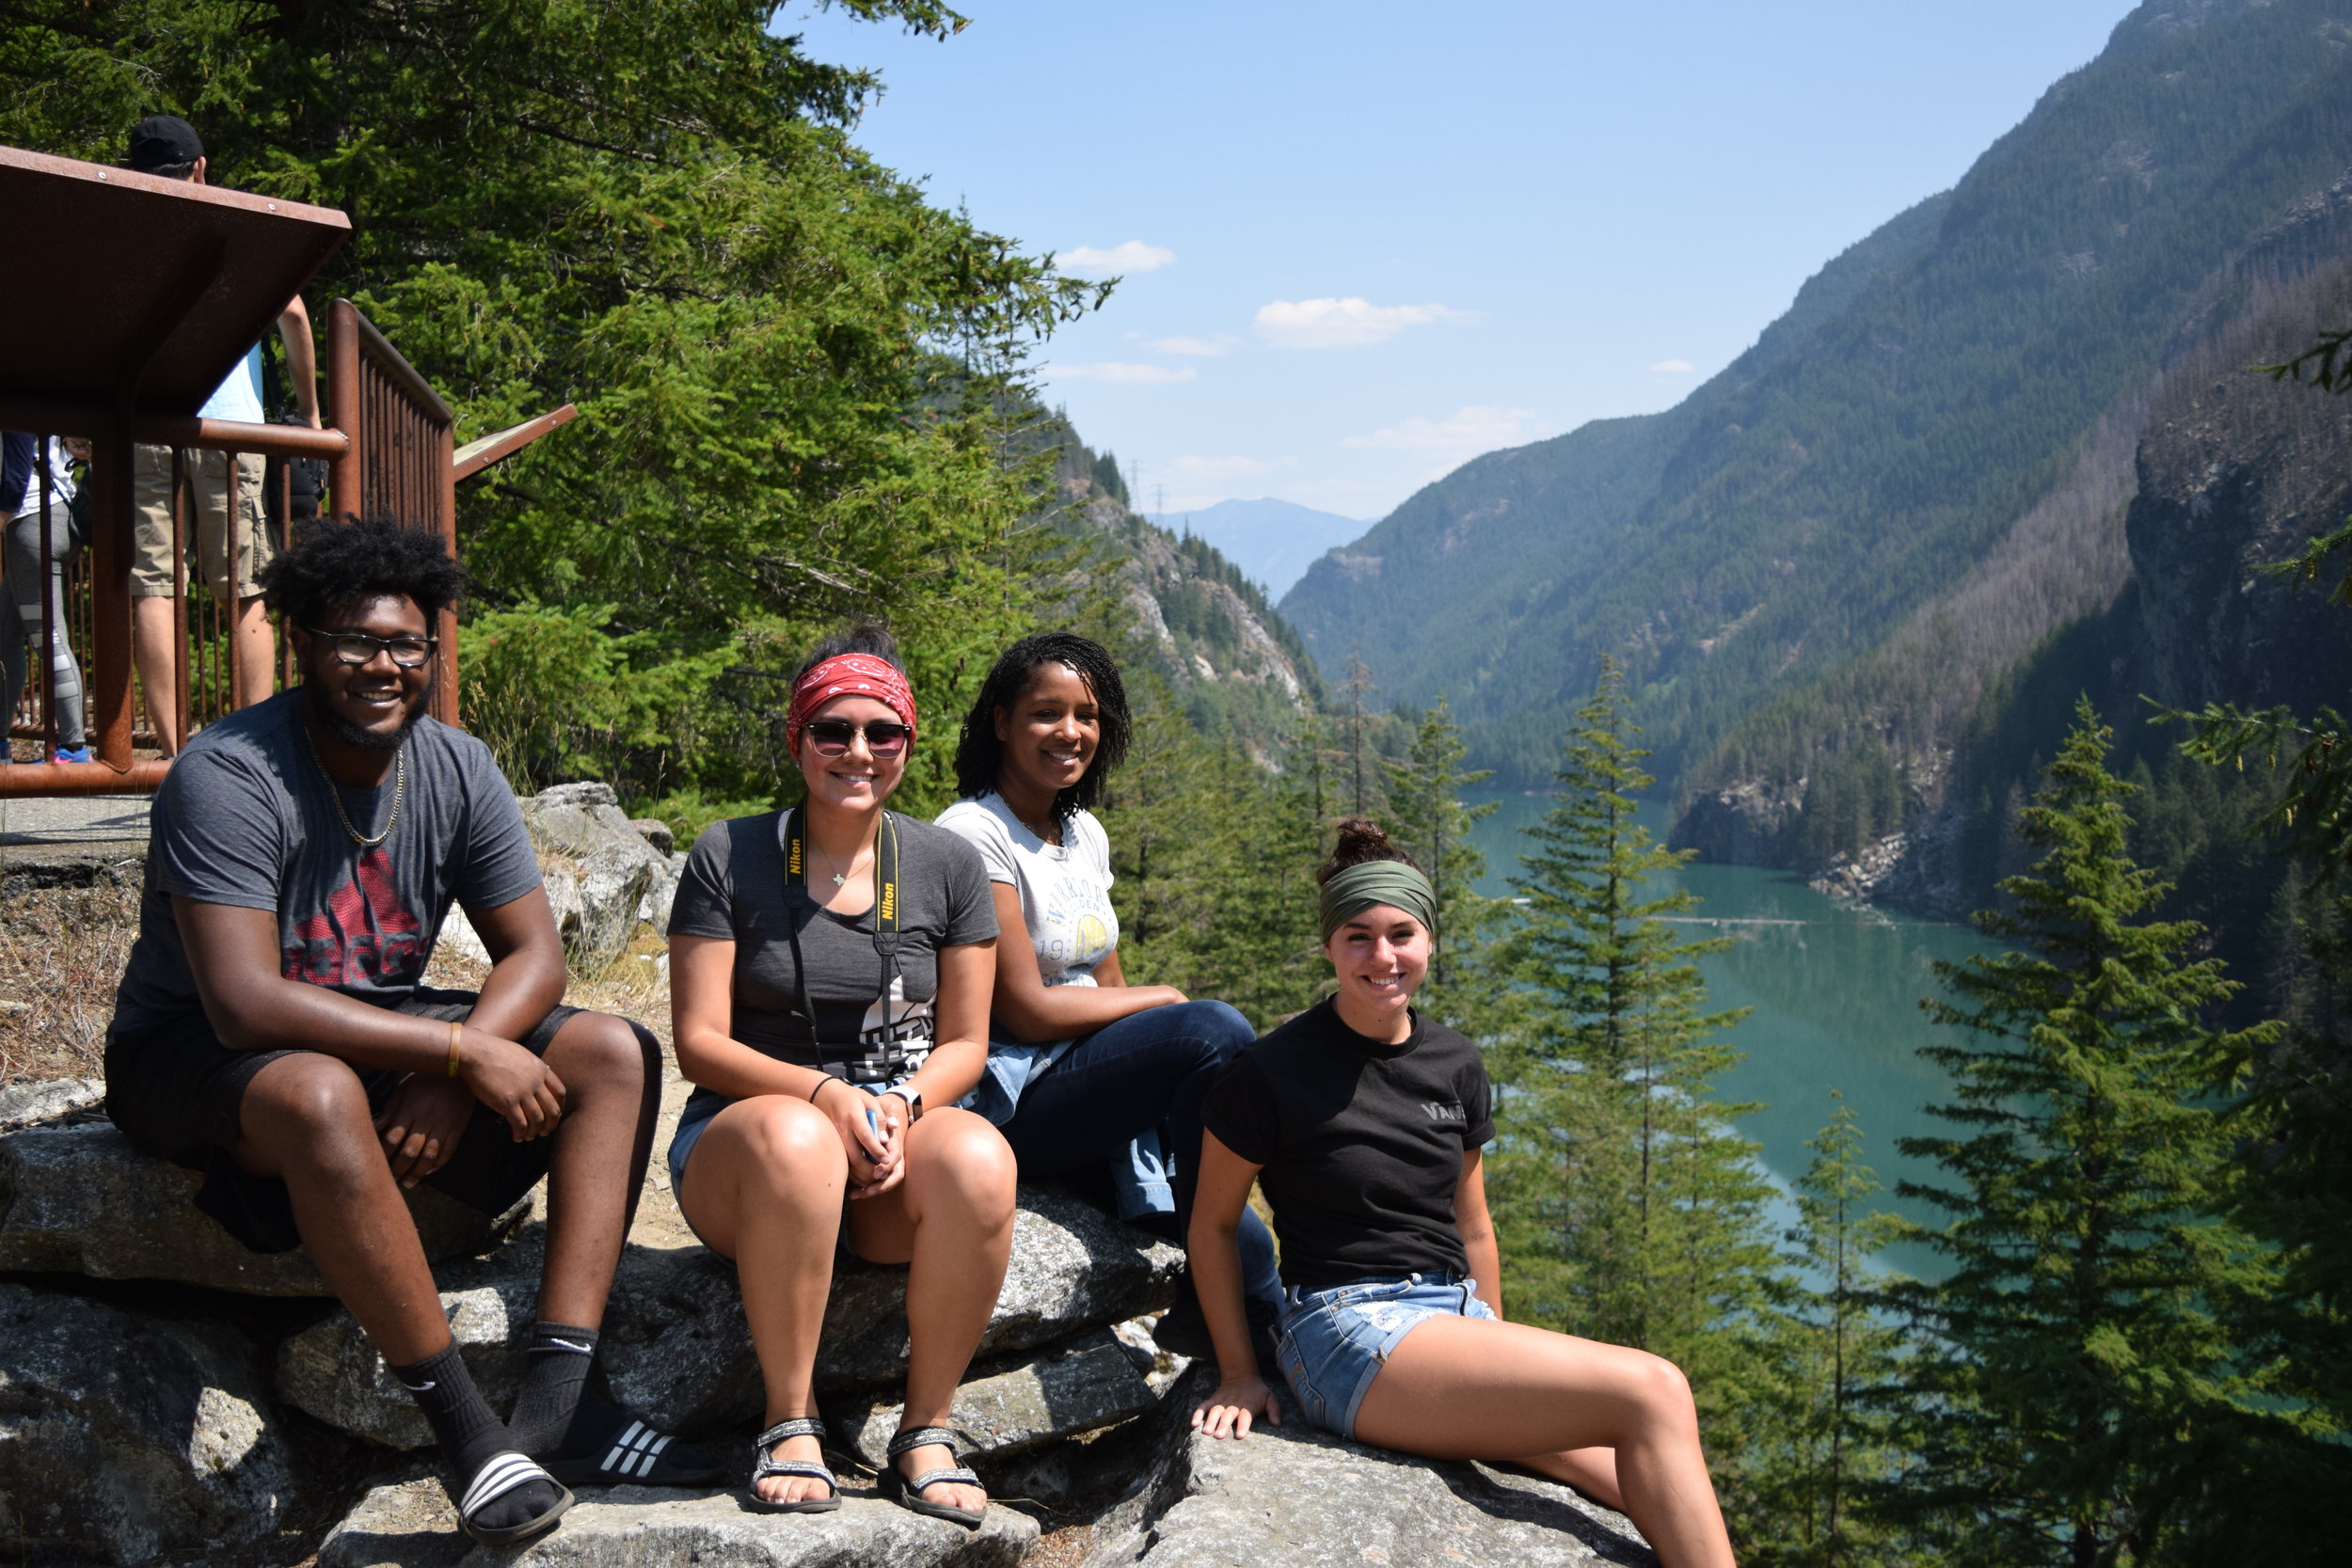 Stretching legs @ Gorge Dam